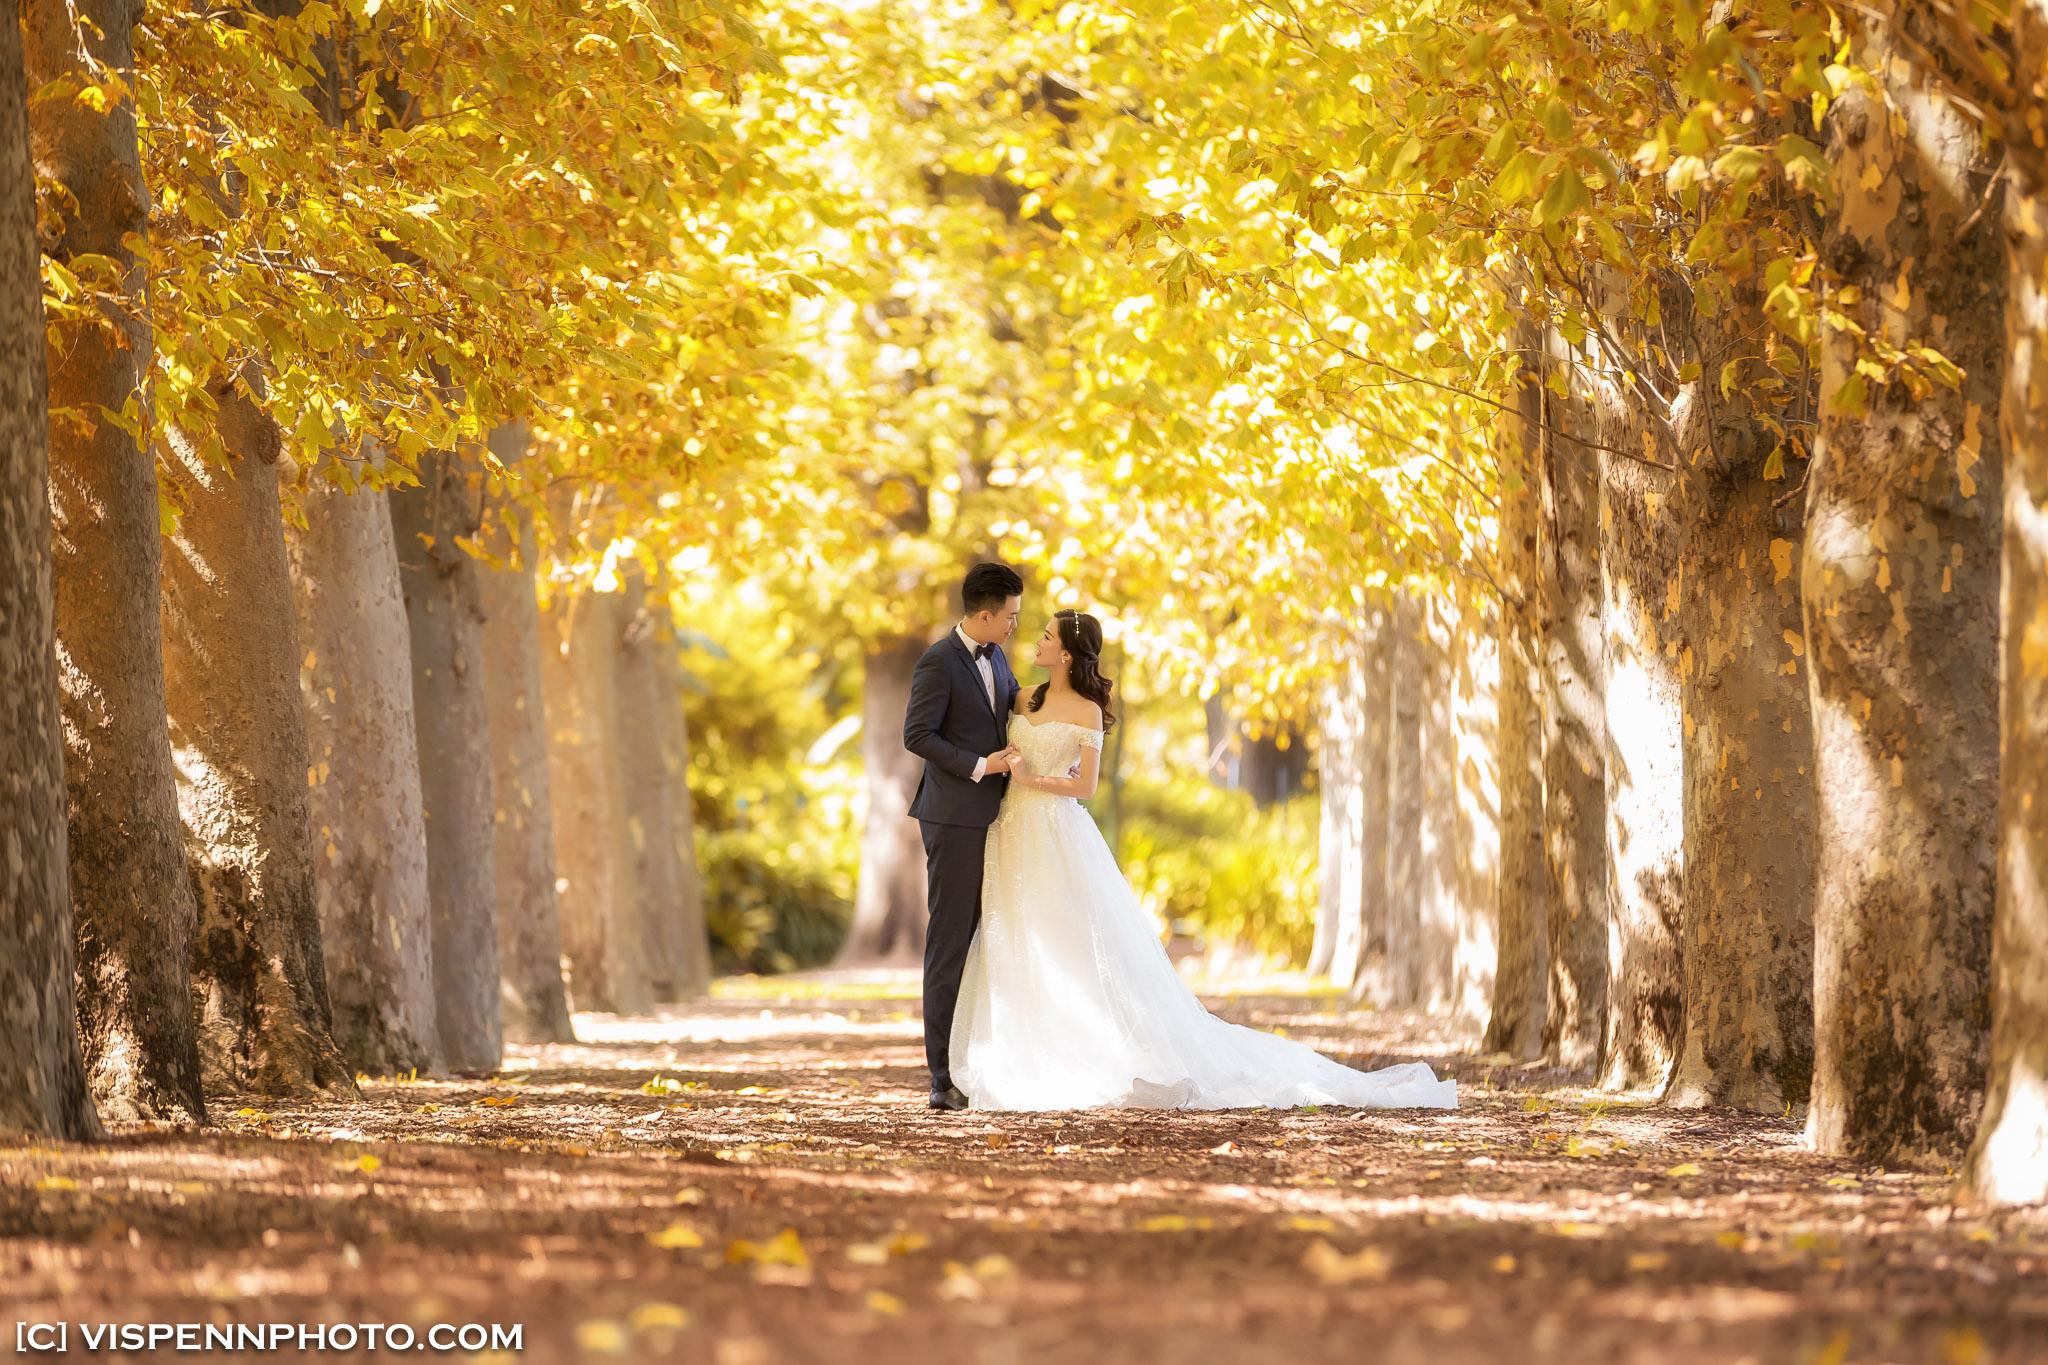 PRE WEDDING Photography Melbourne VISPENN 墨尔本 婚纱照 结婚照 婚纱摄影 AndyCHEN 1360 1DX VISPENN